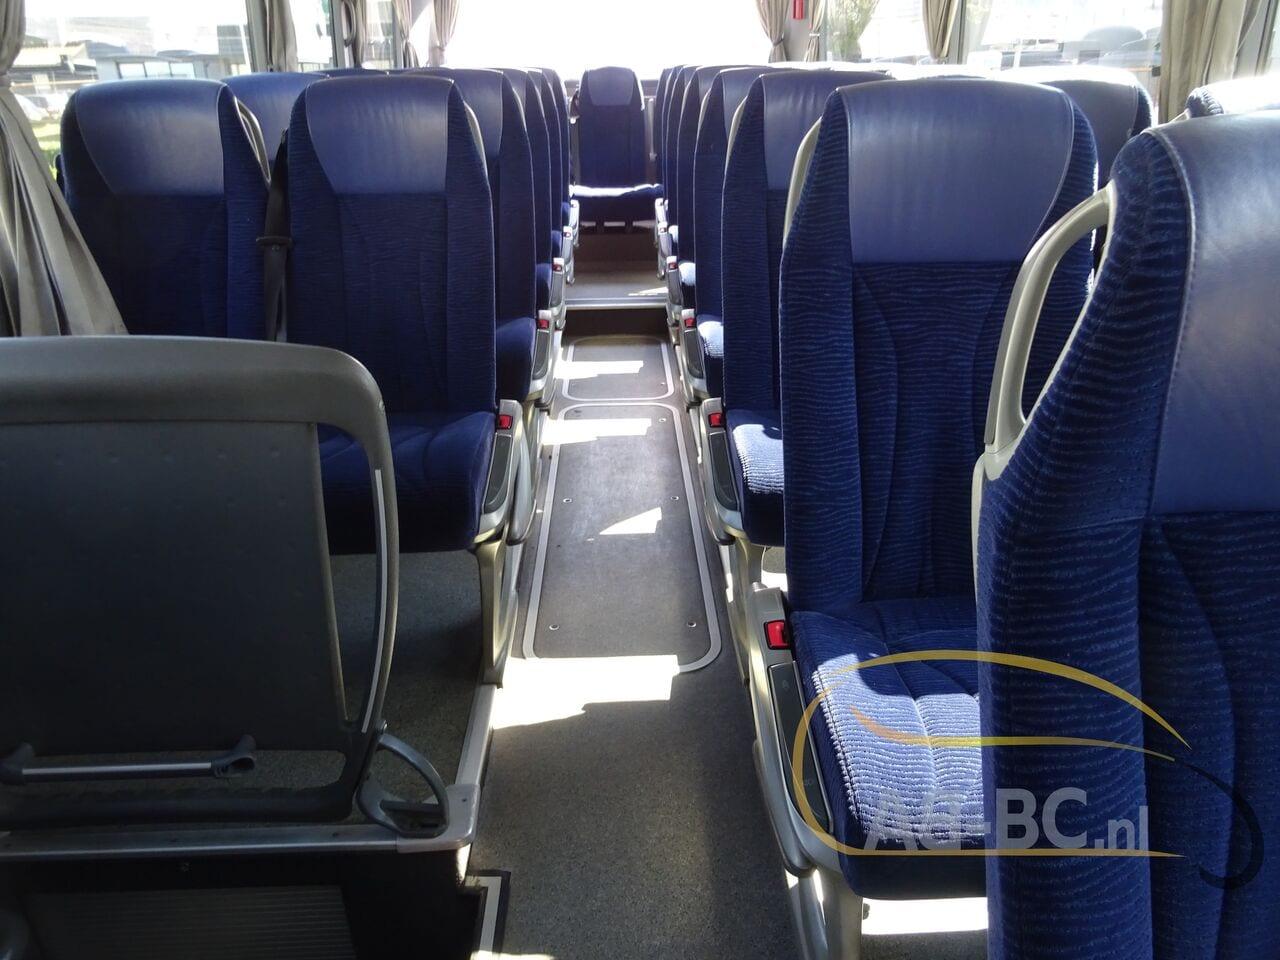 coach-busSETRA-S415-GT-HD-FINAL-EDITION-51-SEATS-LIFTBUS---1620382070557449961_big_05642216e90375dcf53e0389a82efc1b--21050713010665719300